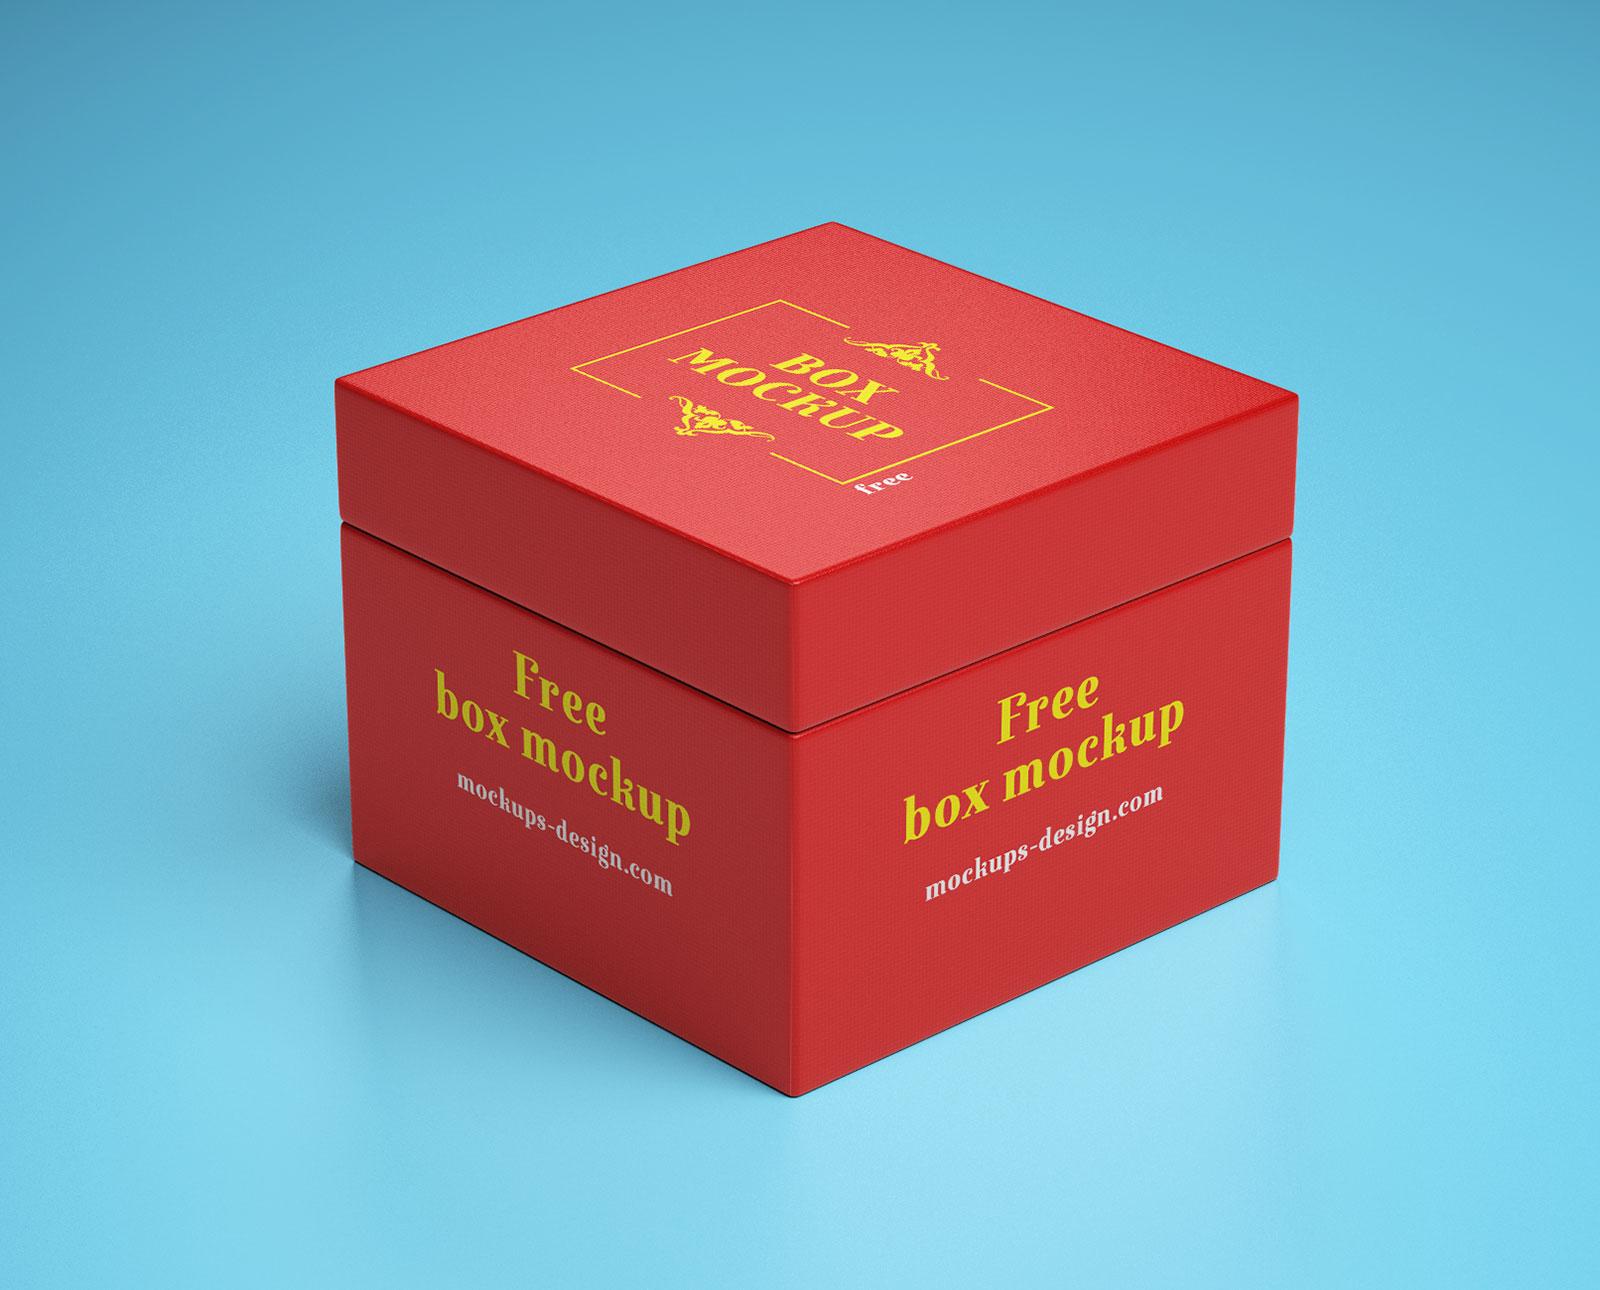 Free Gift Box Packaging Mockup PSD (1)